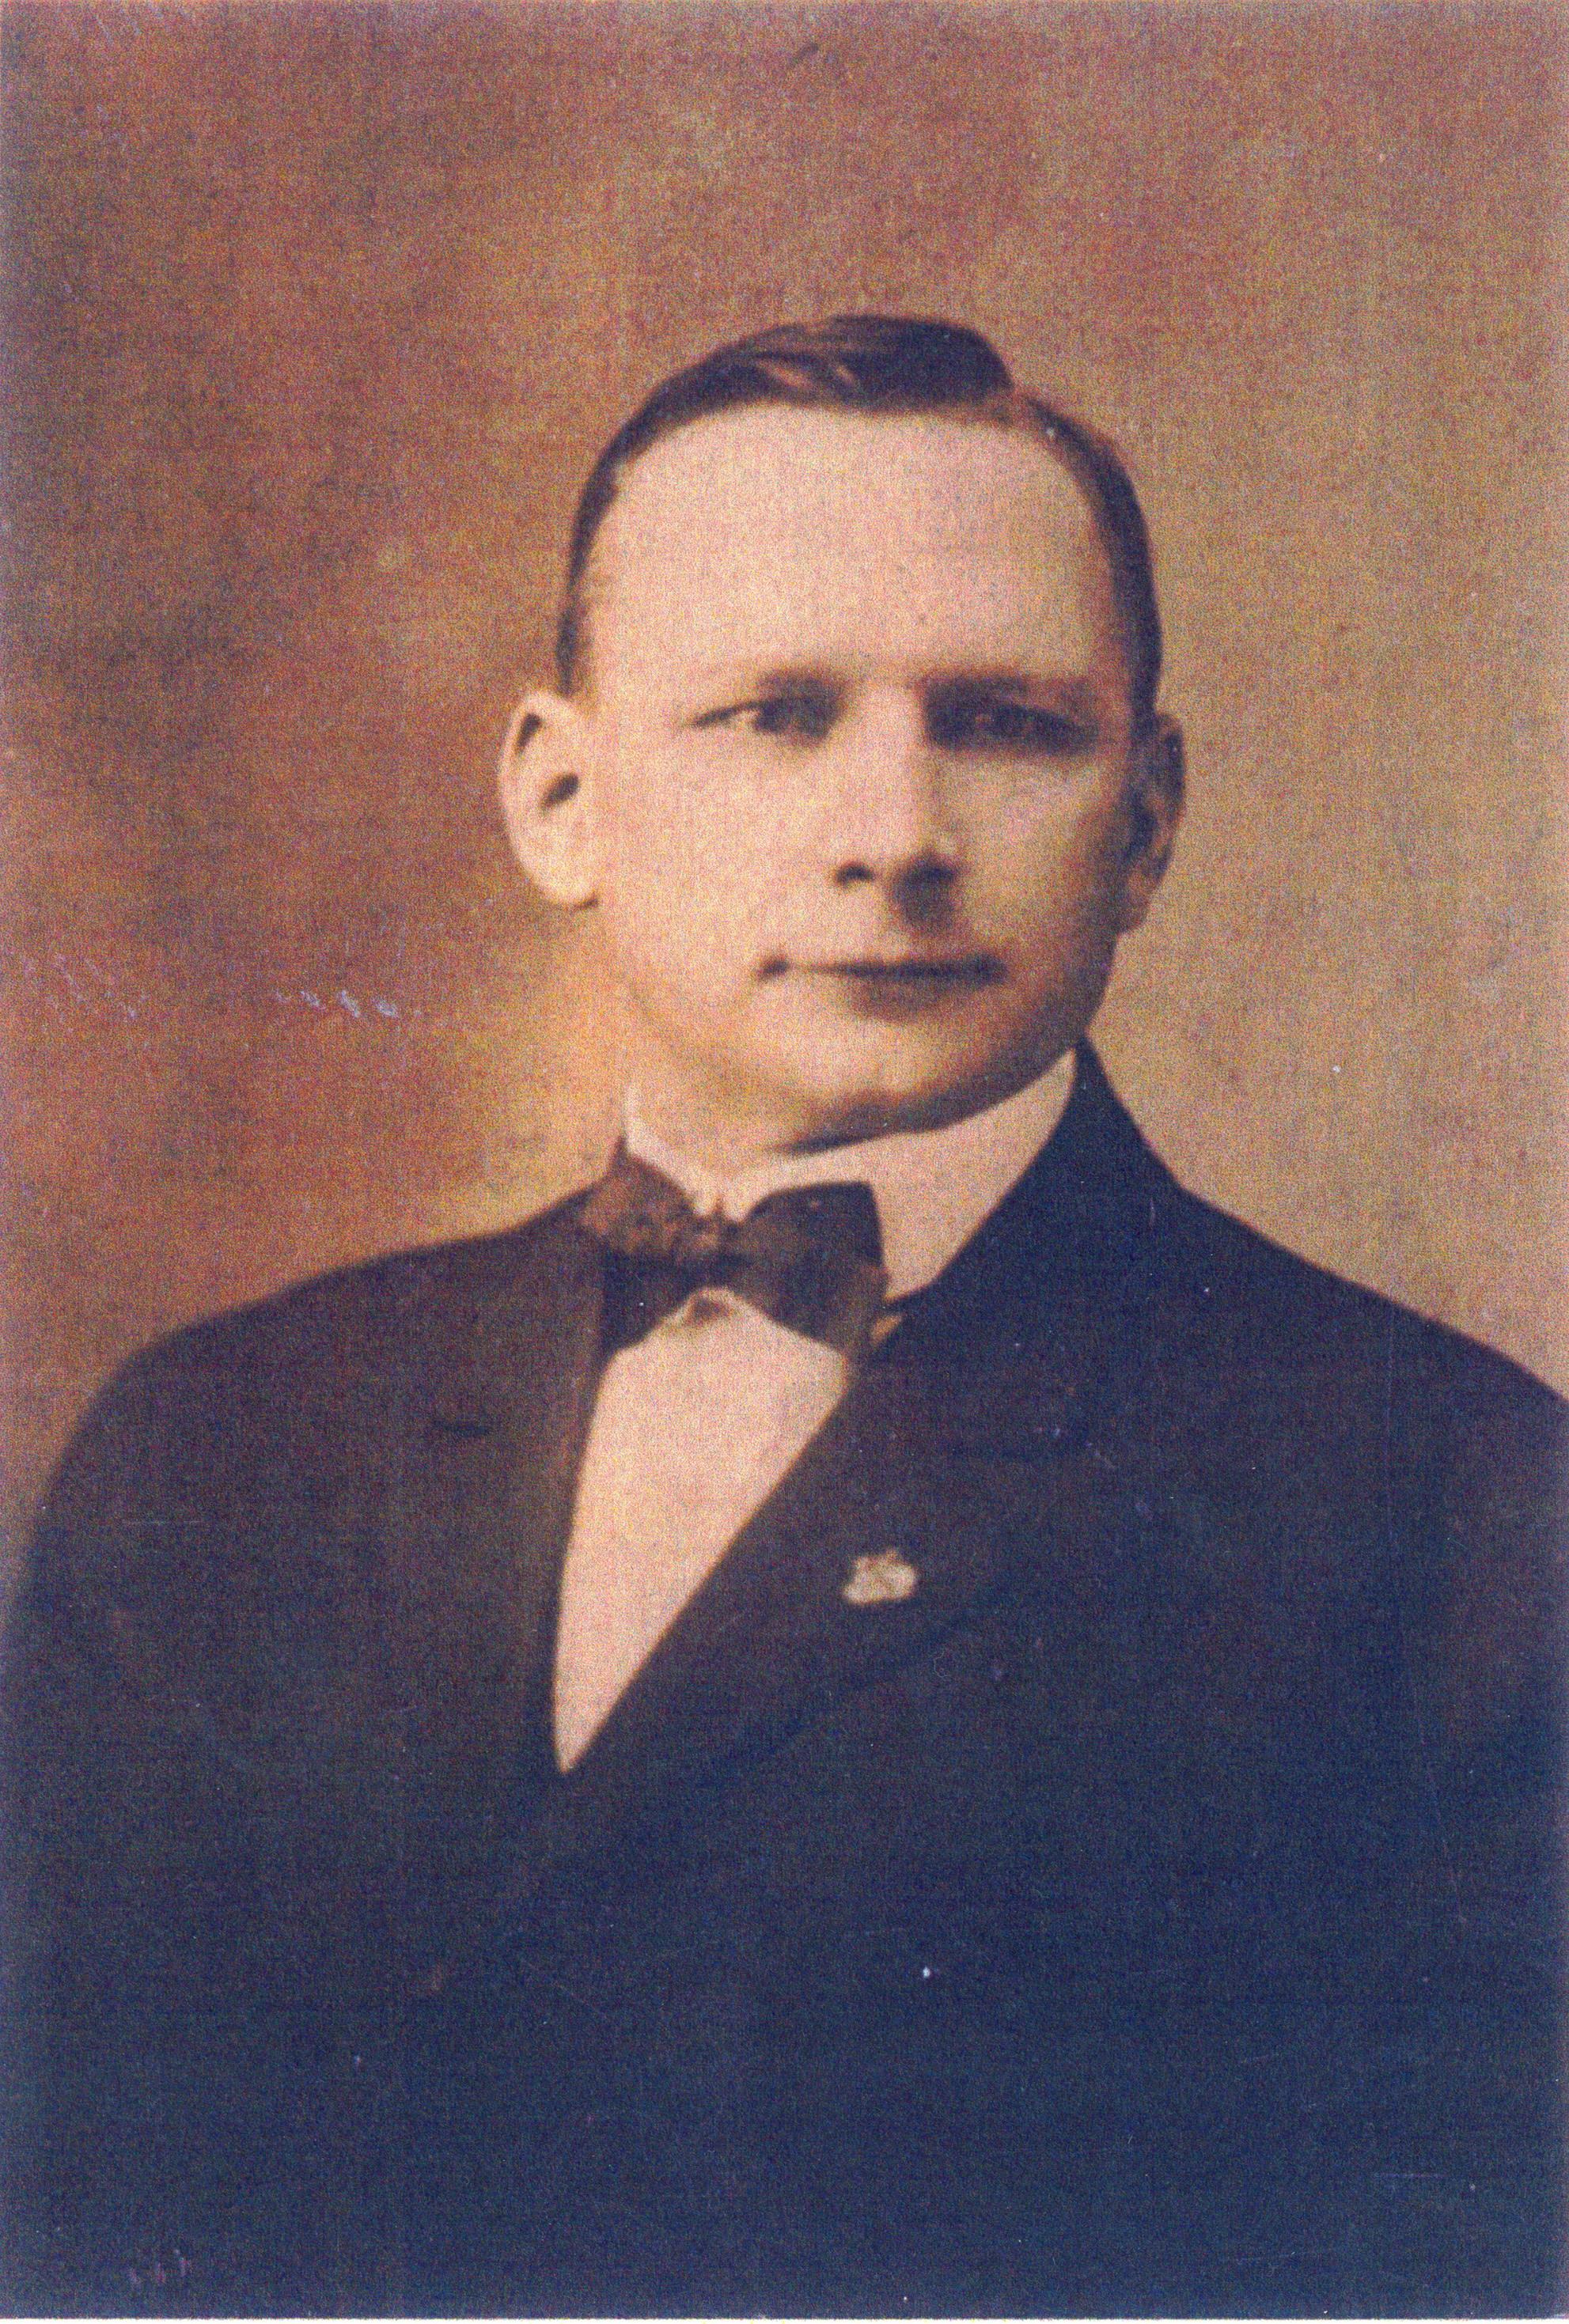 John Joseph Guice